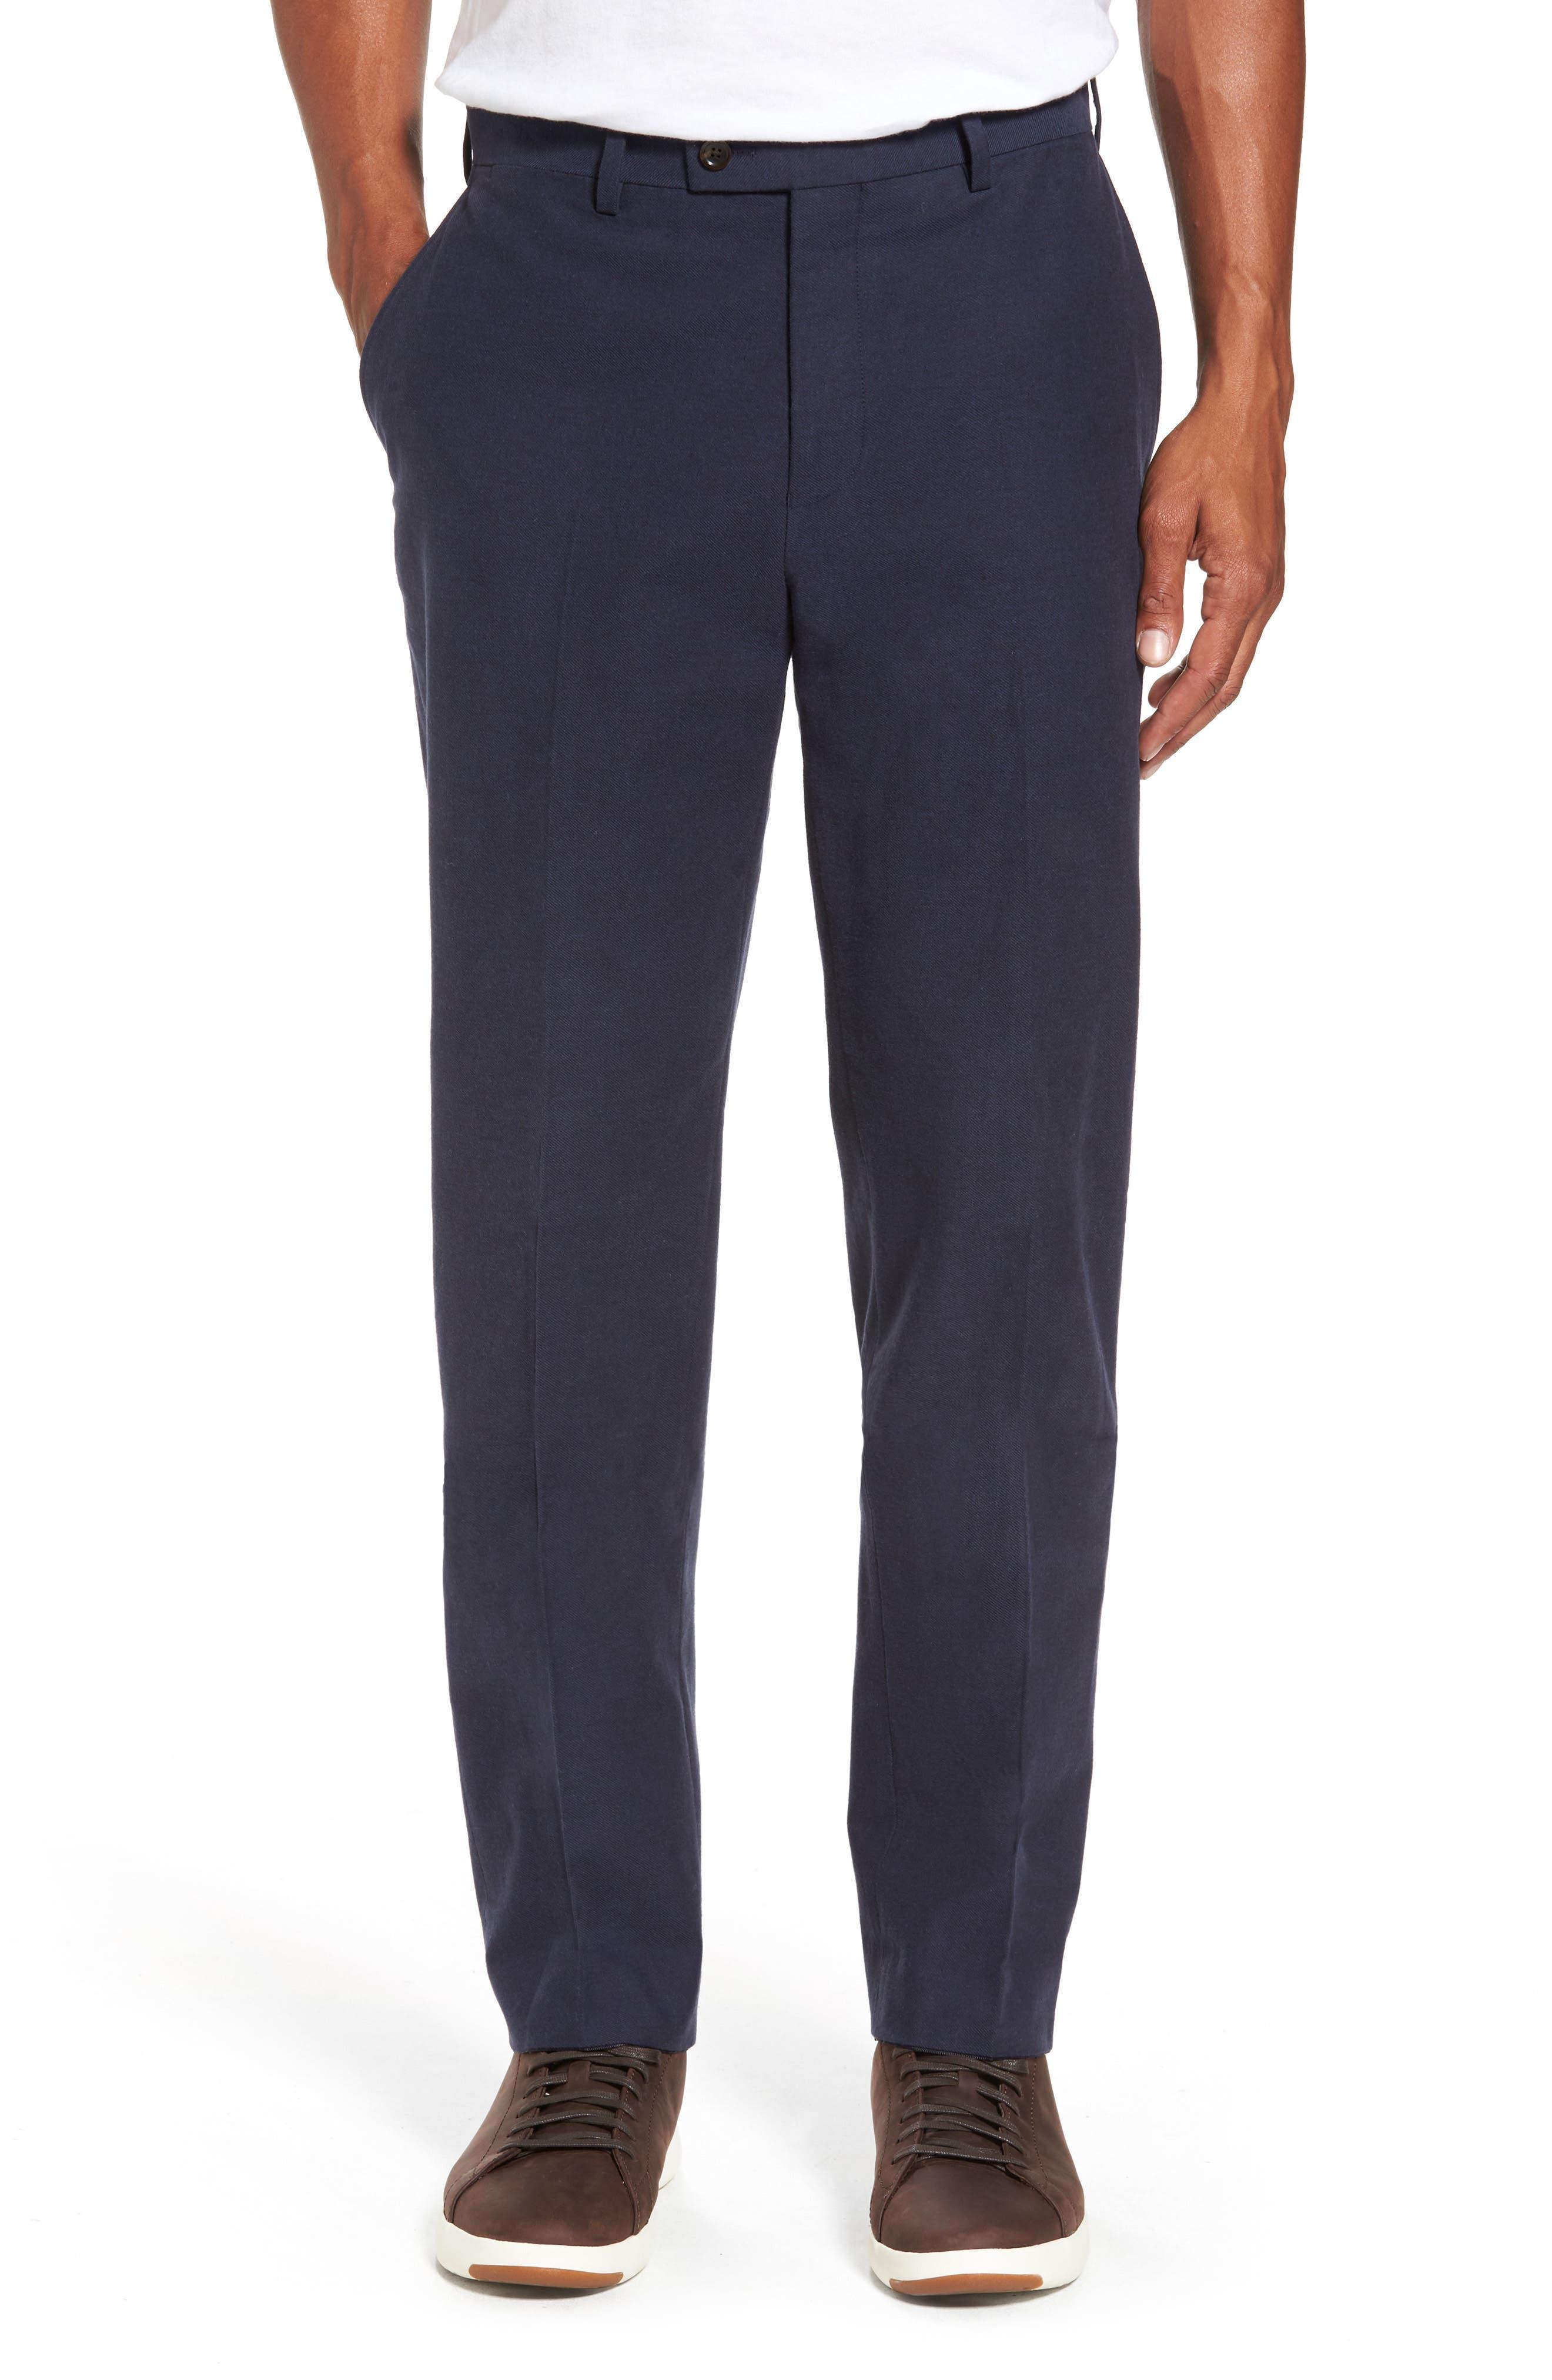 Pembroke Slim Fit Twill Pants,                         Main,                         color, Navy